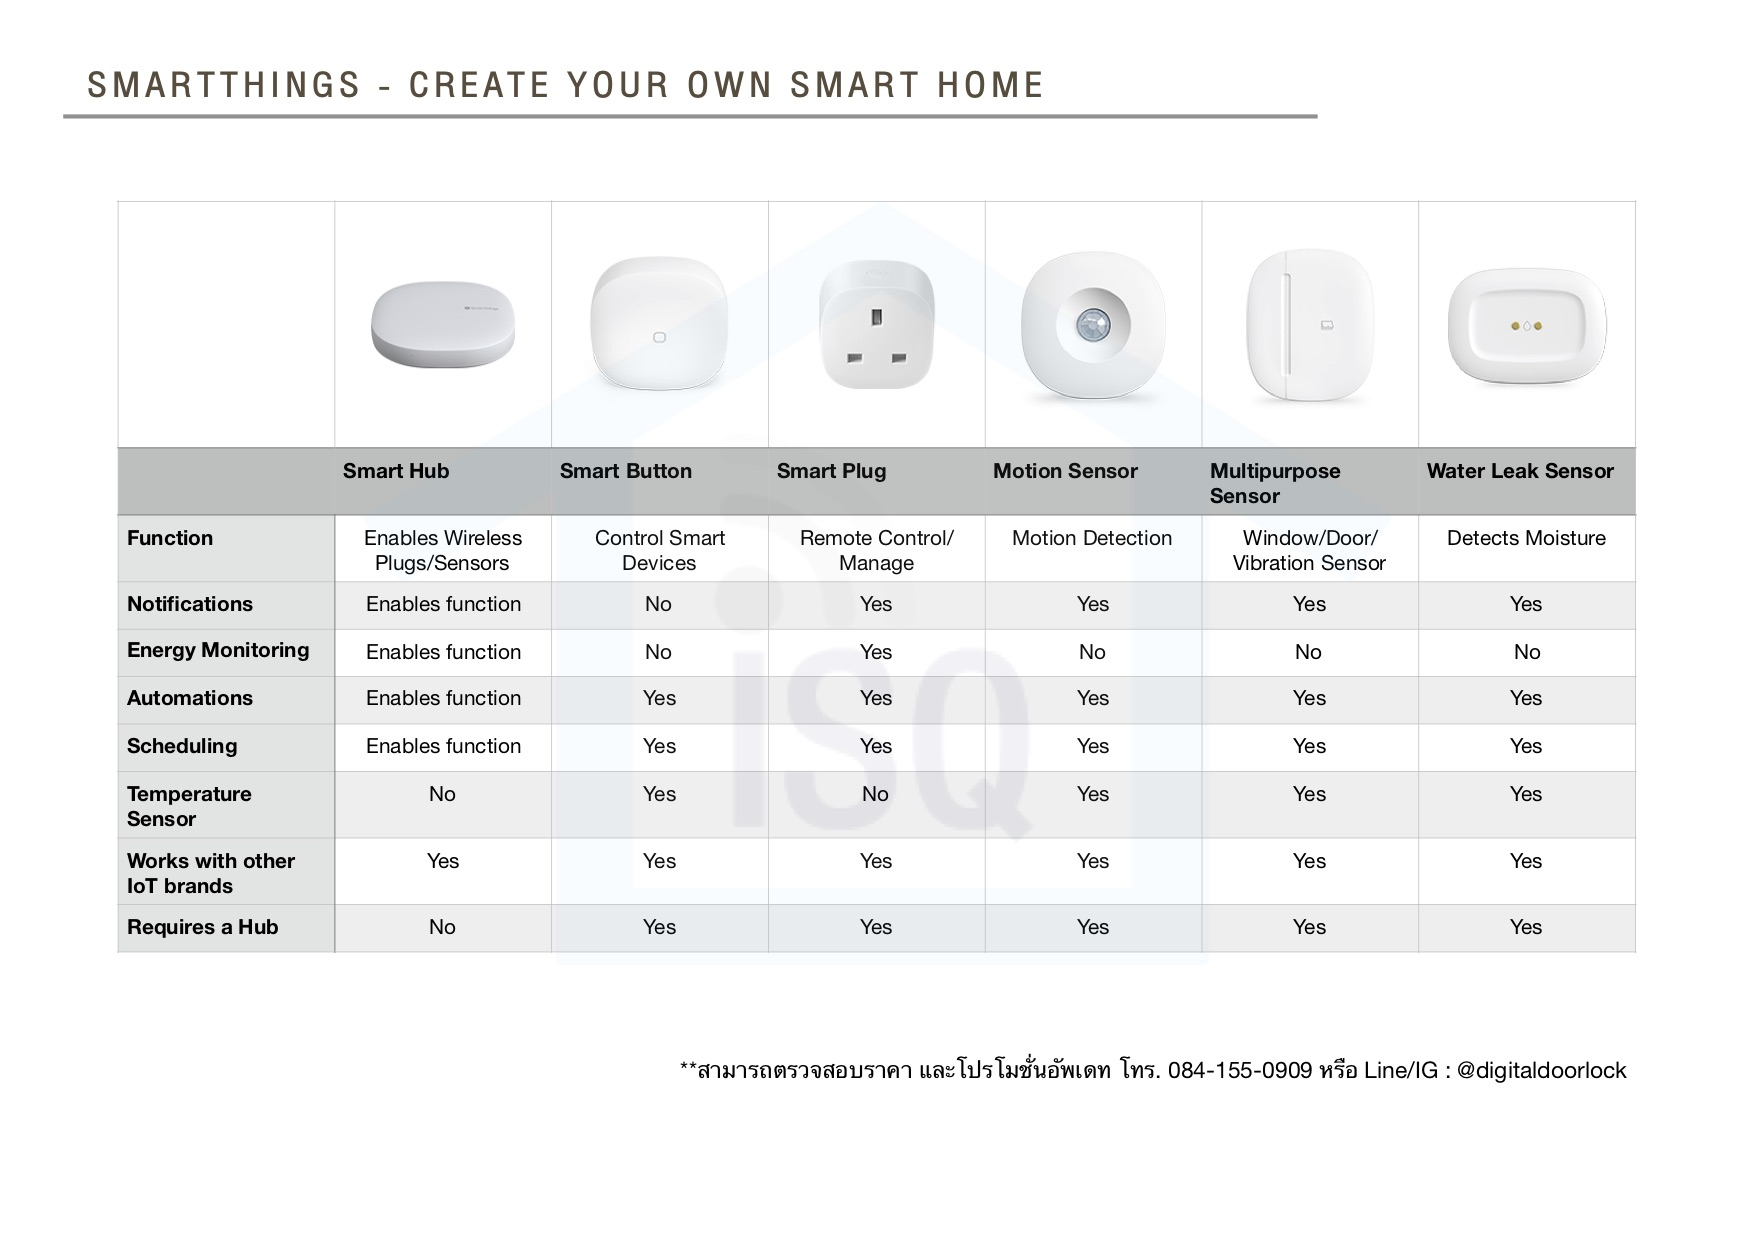 Samsung smartthings smart home smart life